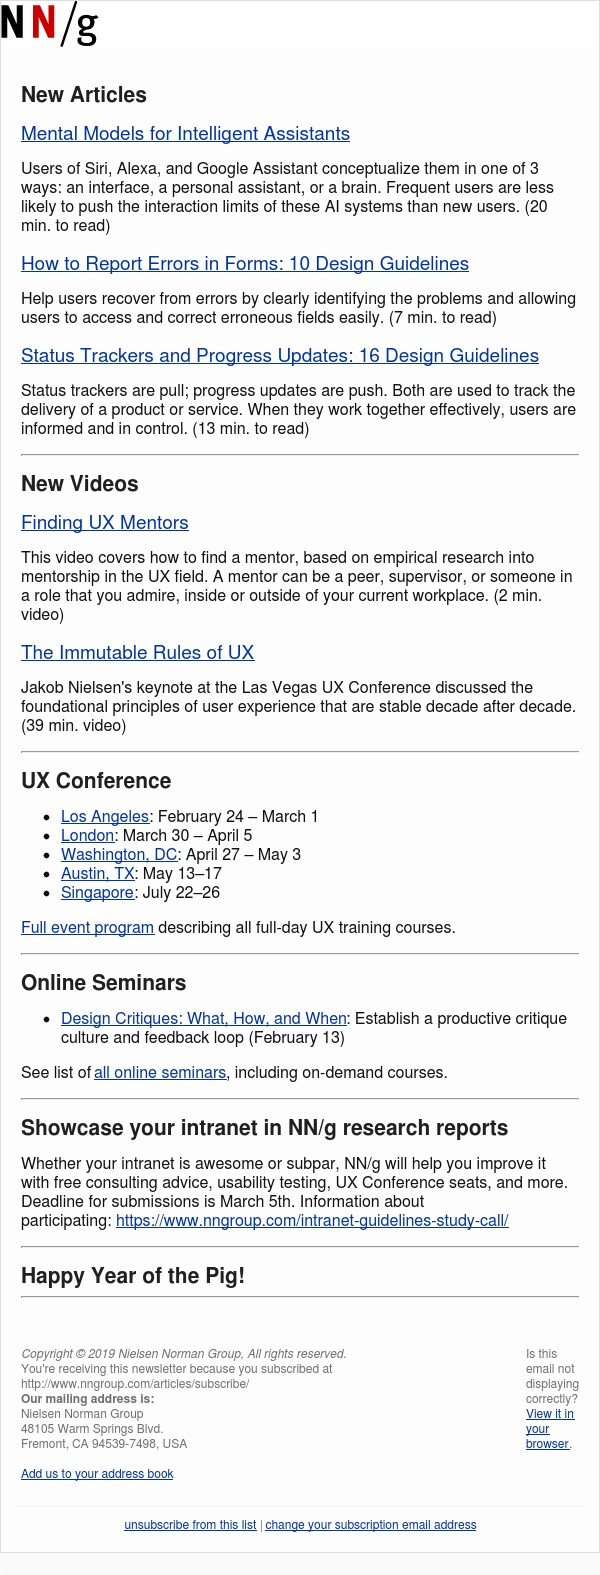 Intelligent Assistants | Form Errors | Status Trackers | UX Mentors | UX Rules